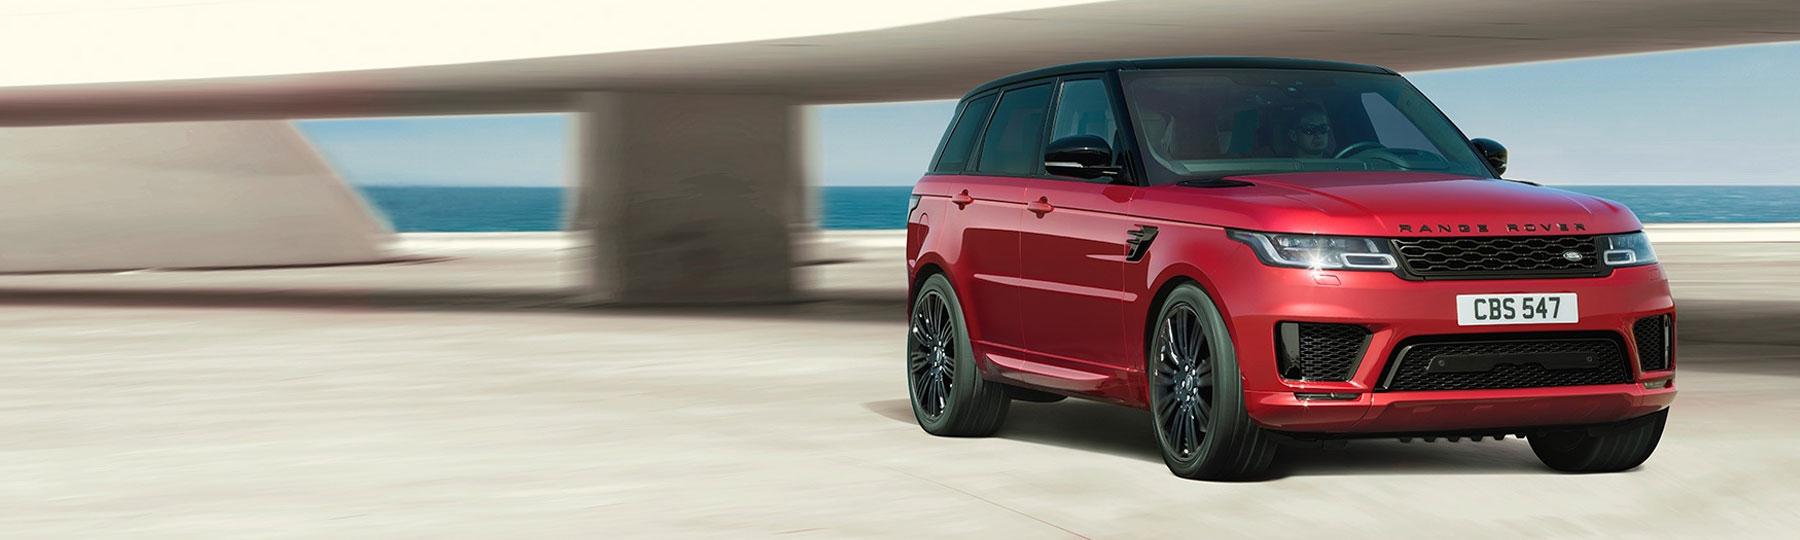 in co at del sport hse rover auto for denver sales inventory land details norte range sale